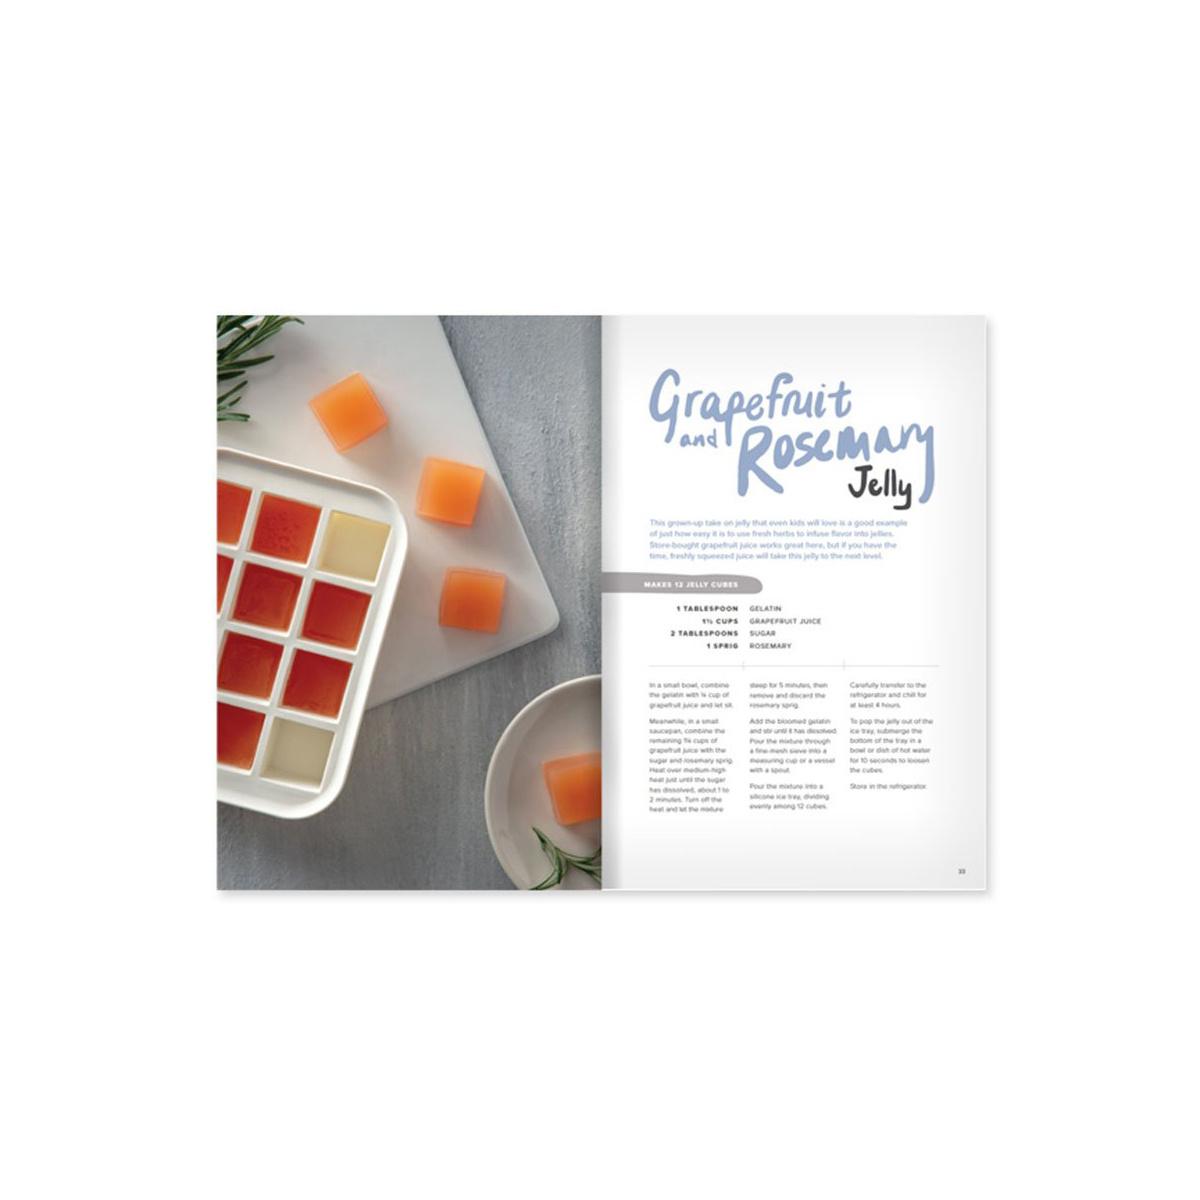 w and p design Ice Tray Treats Cookbook